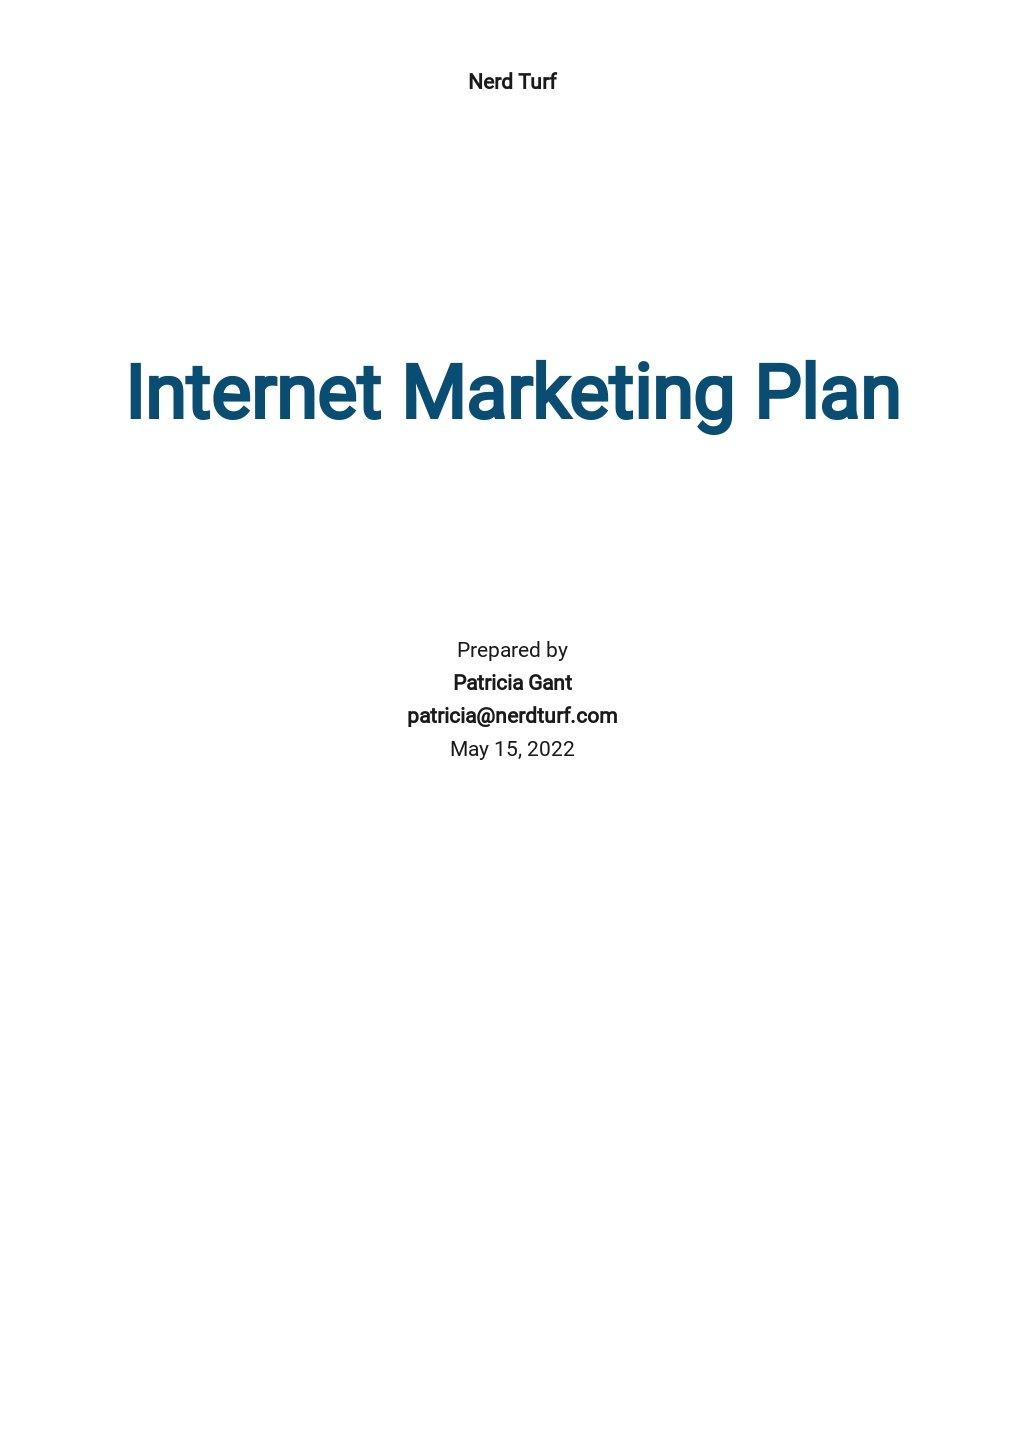 Internet Marketing Plan Template